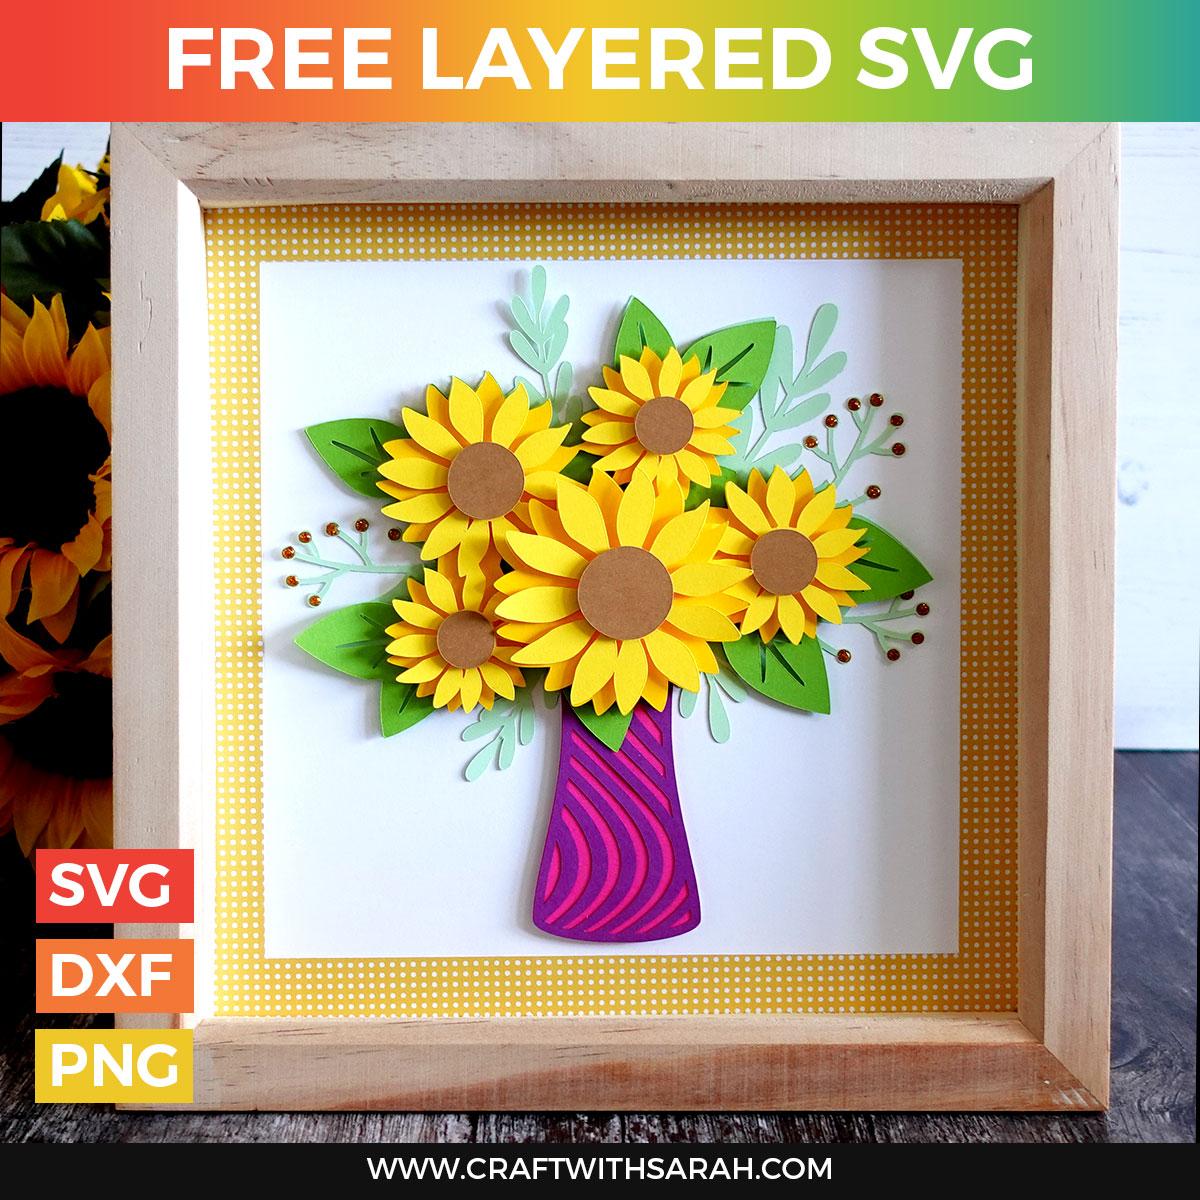 Sunflower Vase Free Layered SVG